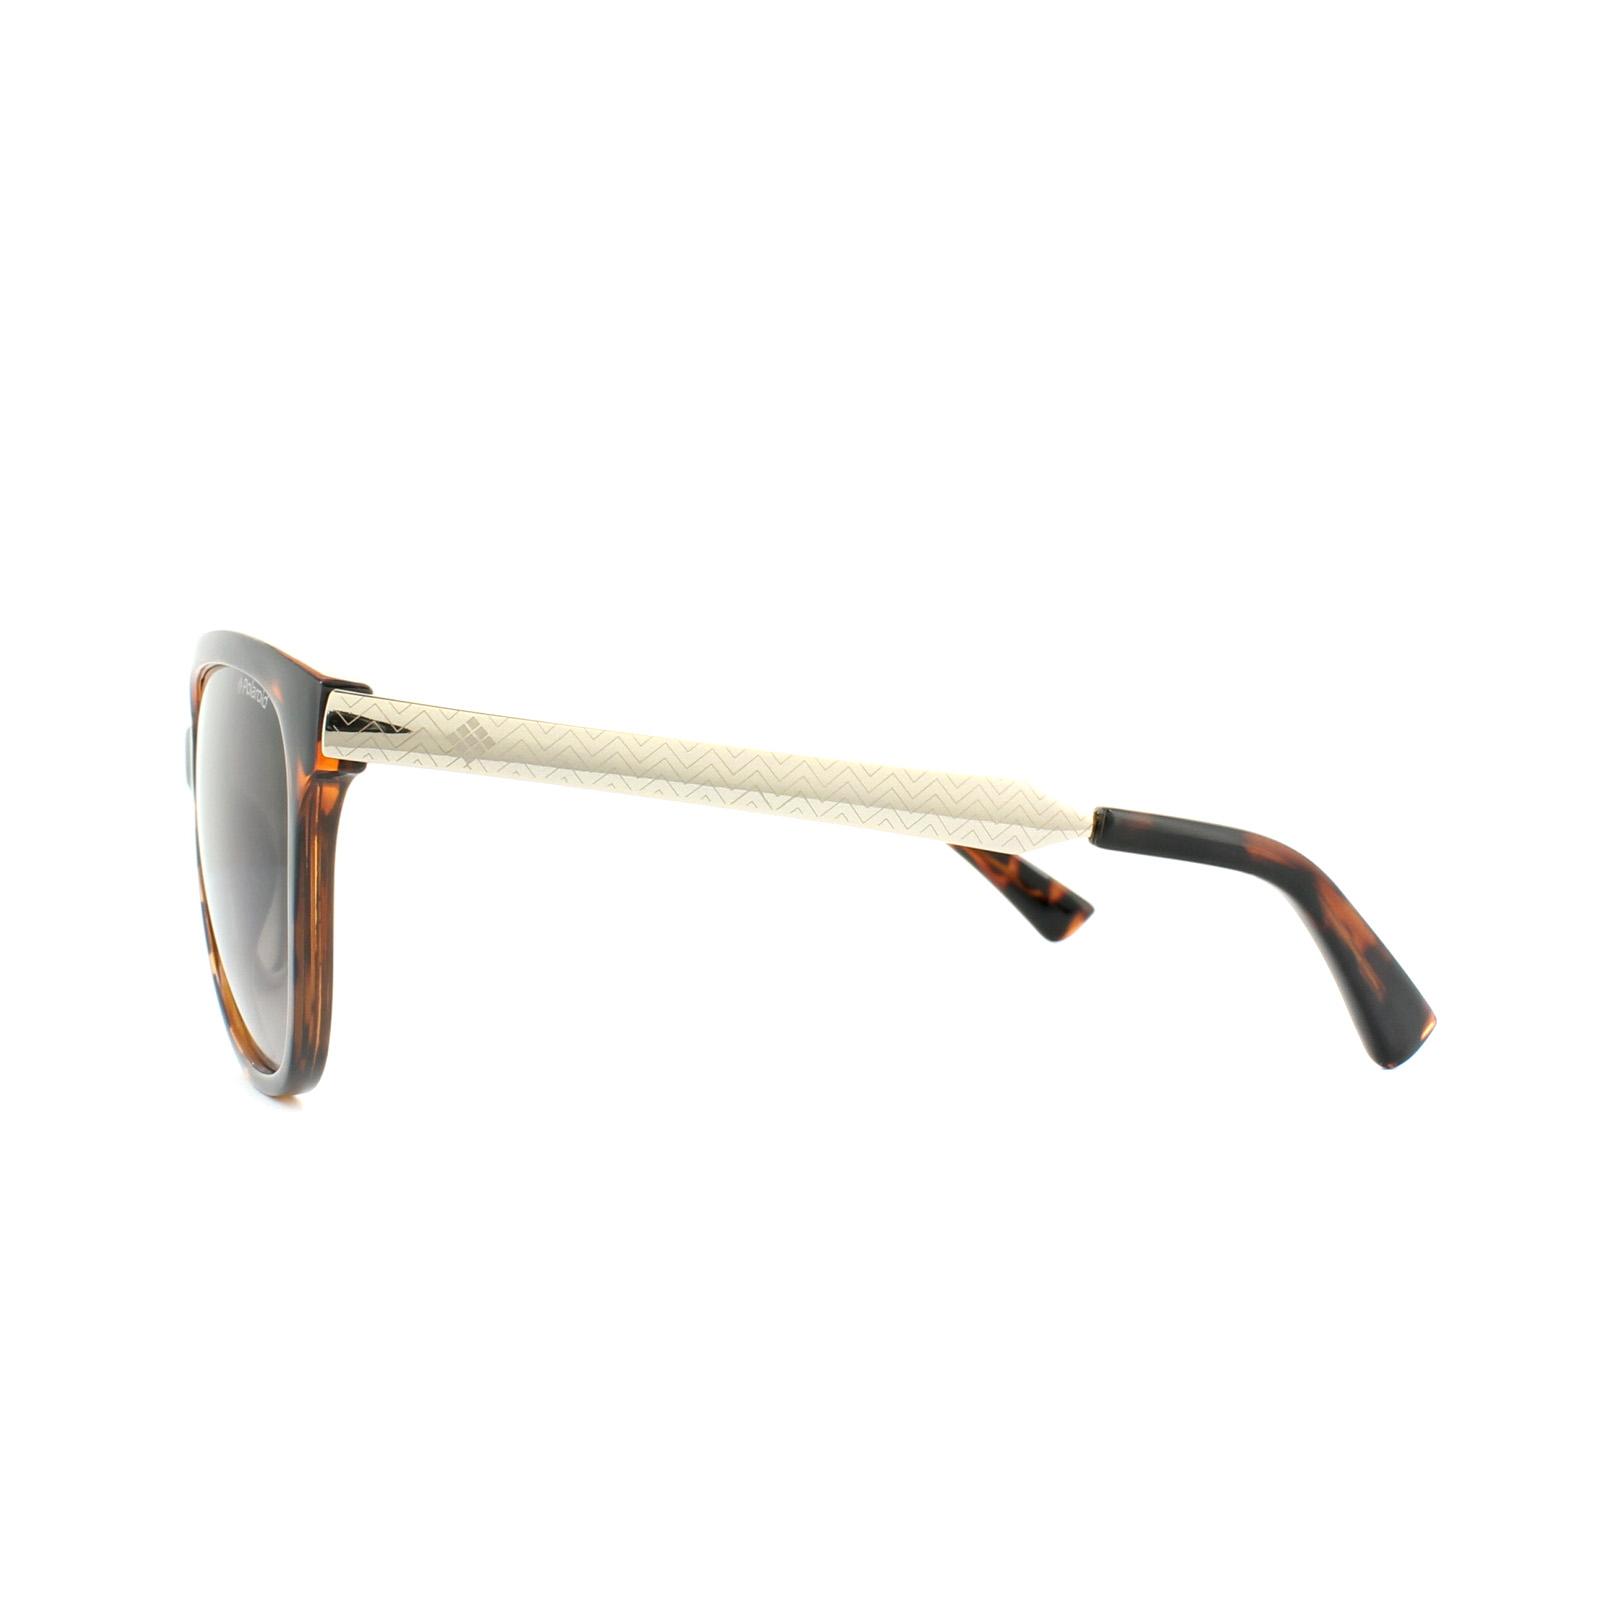 fbce92ee8b Sentinel Polaroid Sunglasses PLD 5016 S LLY 94 Havana Gold Brown Gradient  Polarized